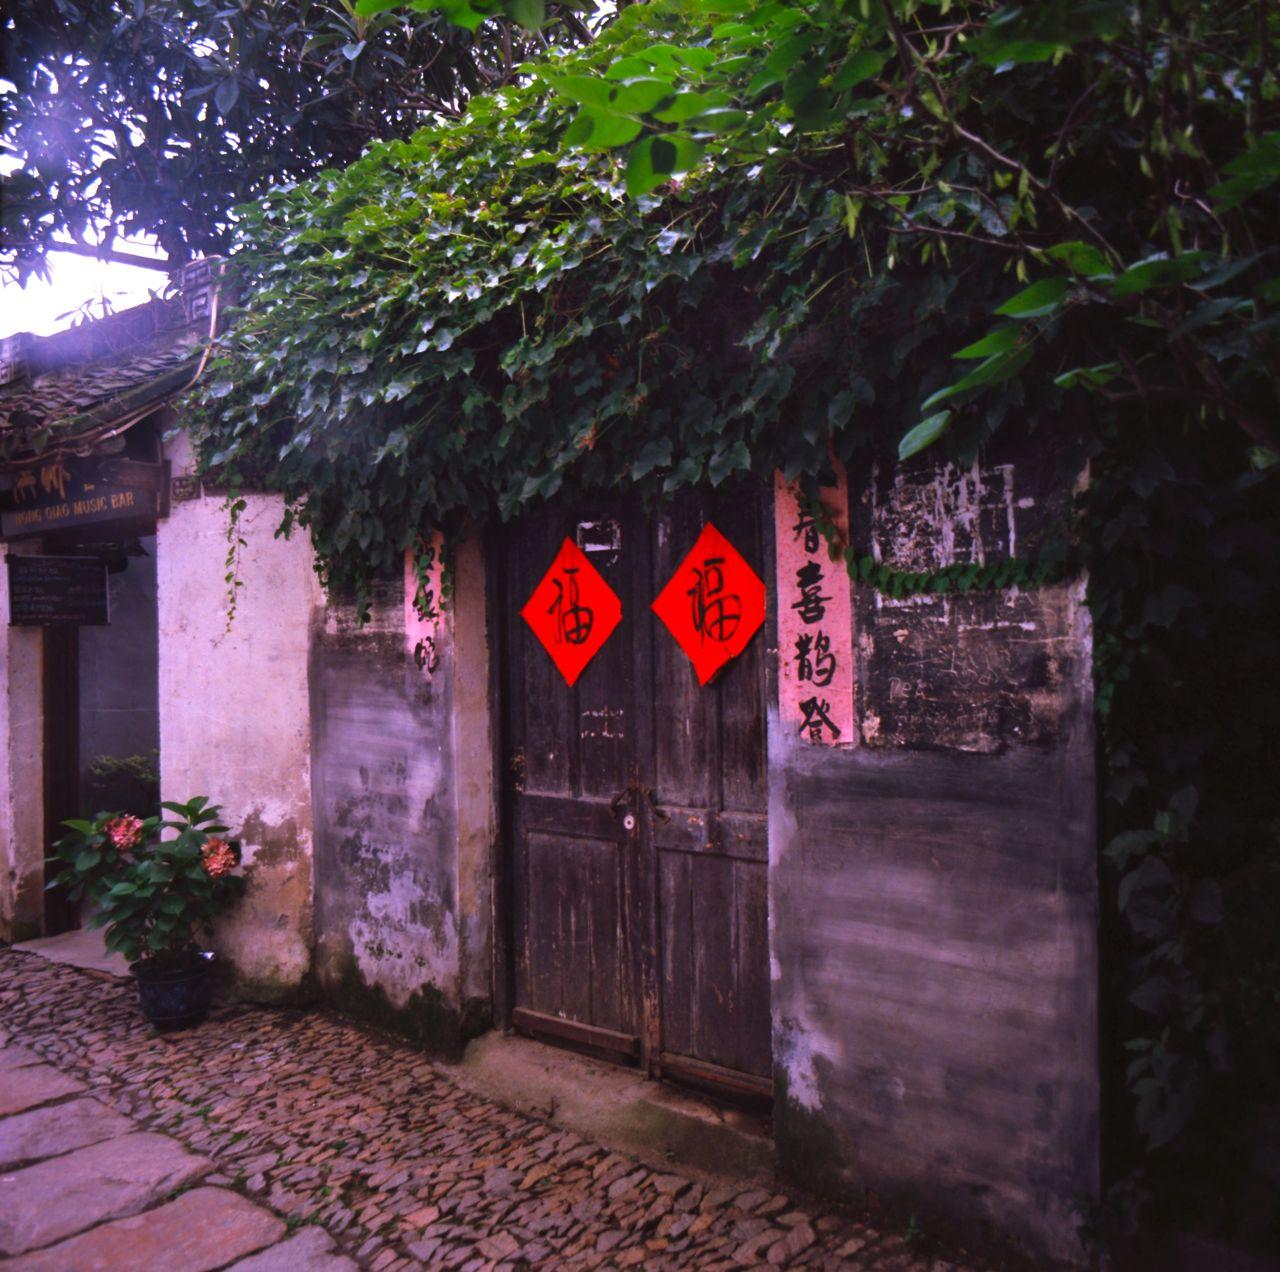 用直 / Luzhi, China, July 2014